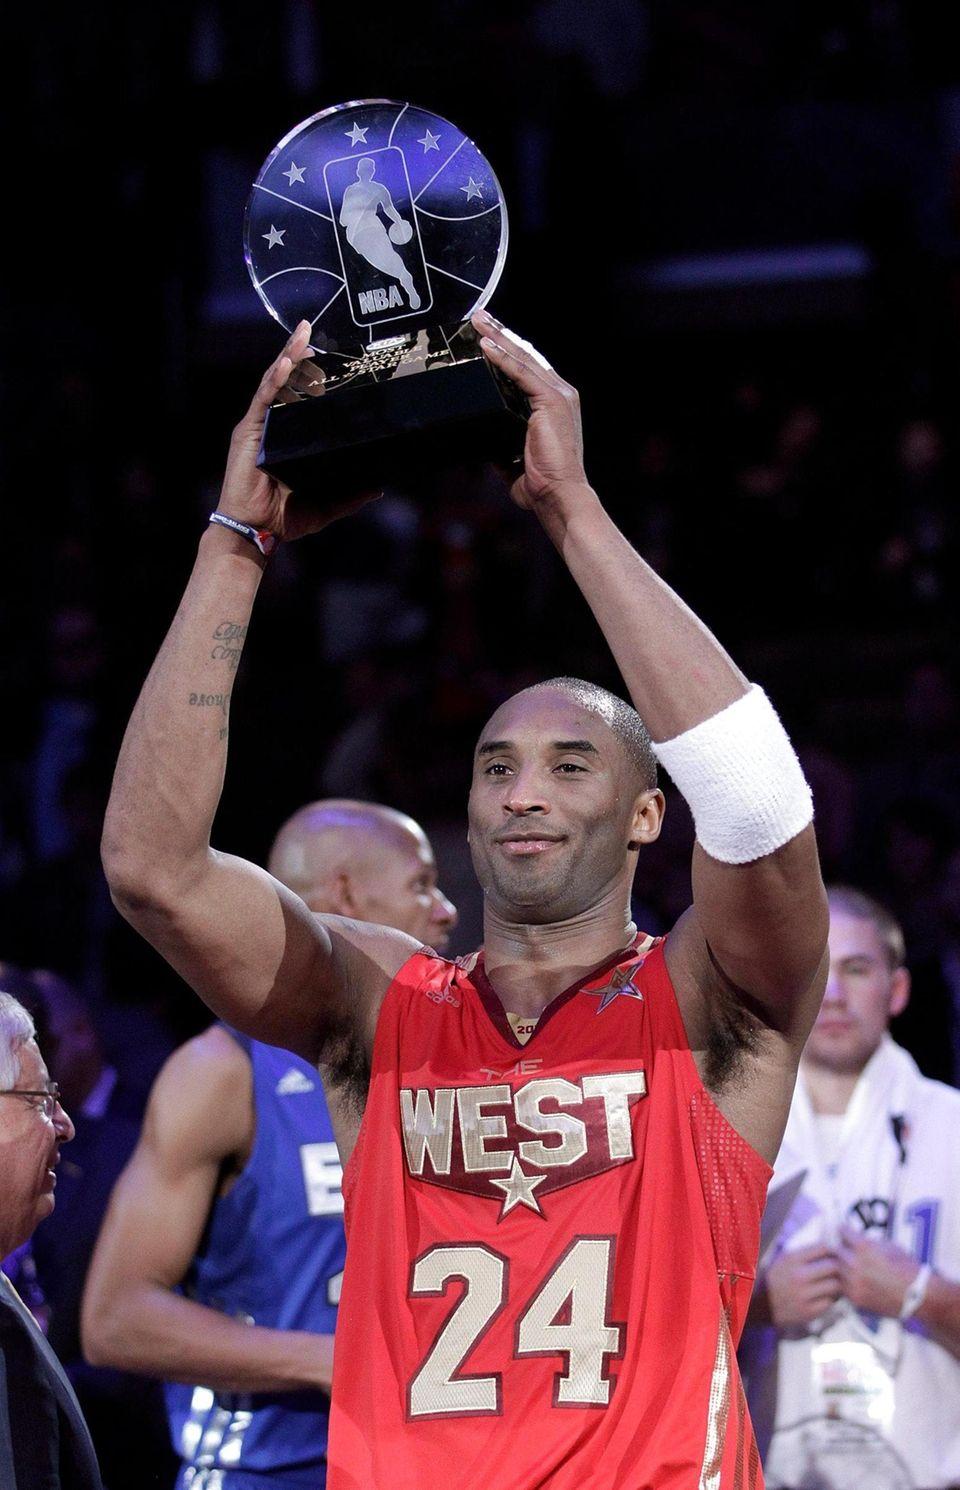 Kobe Bryant has been the star of stars